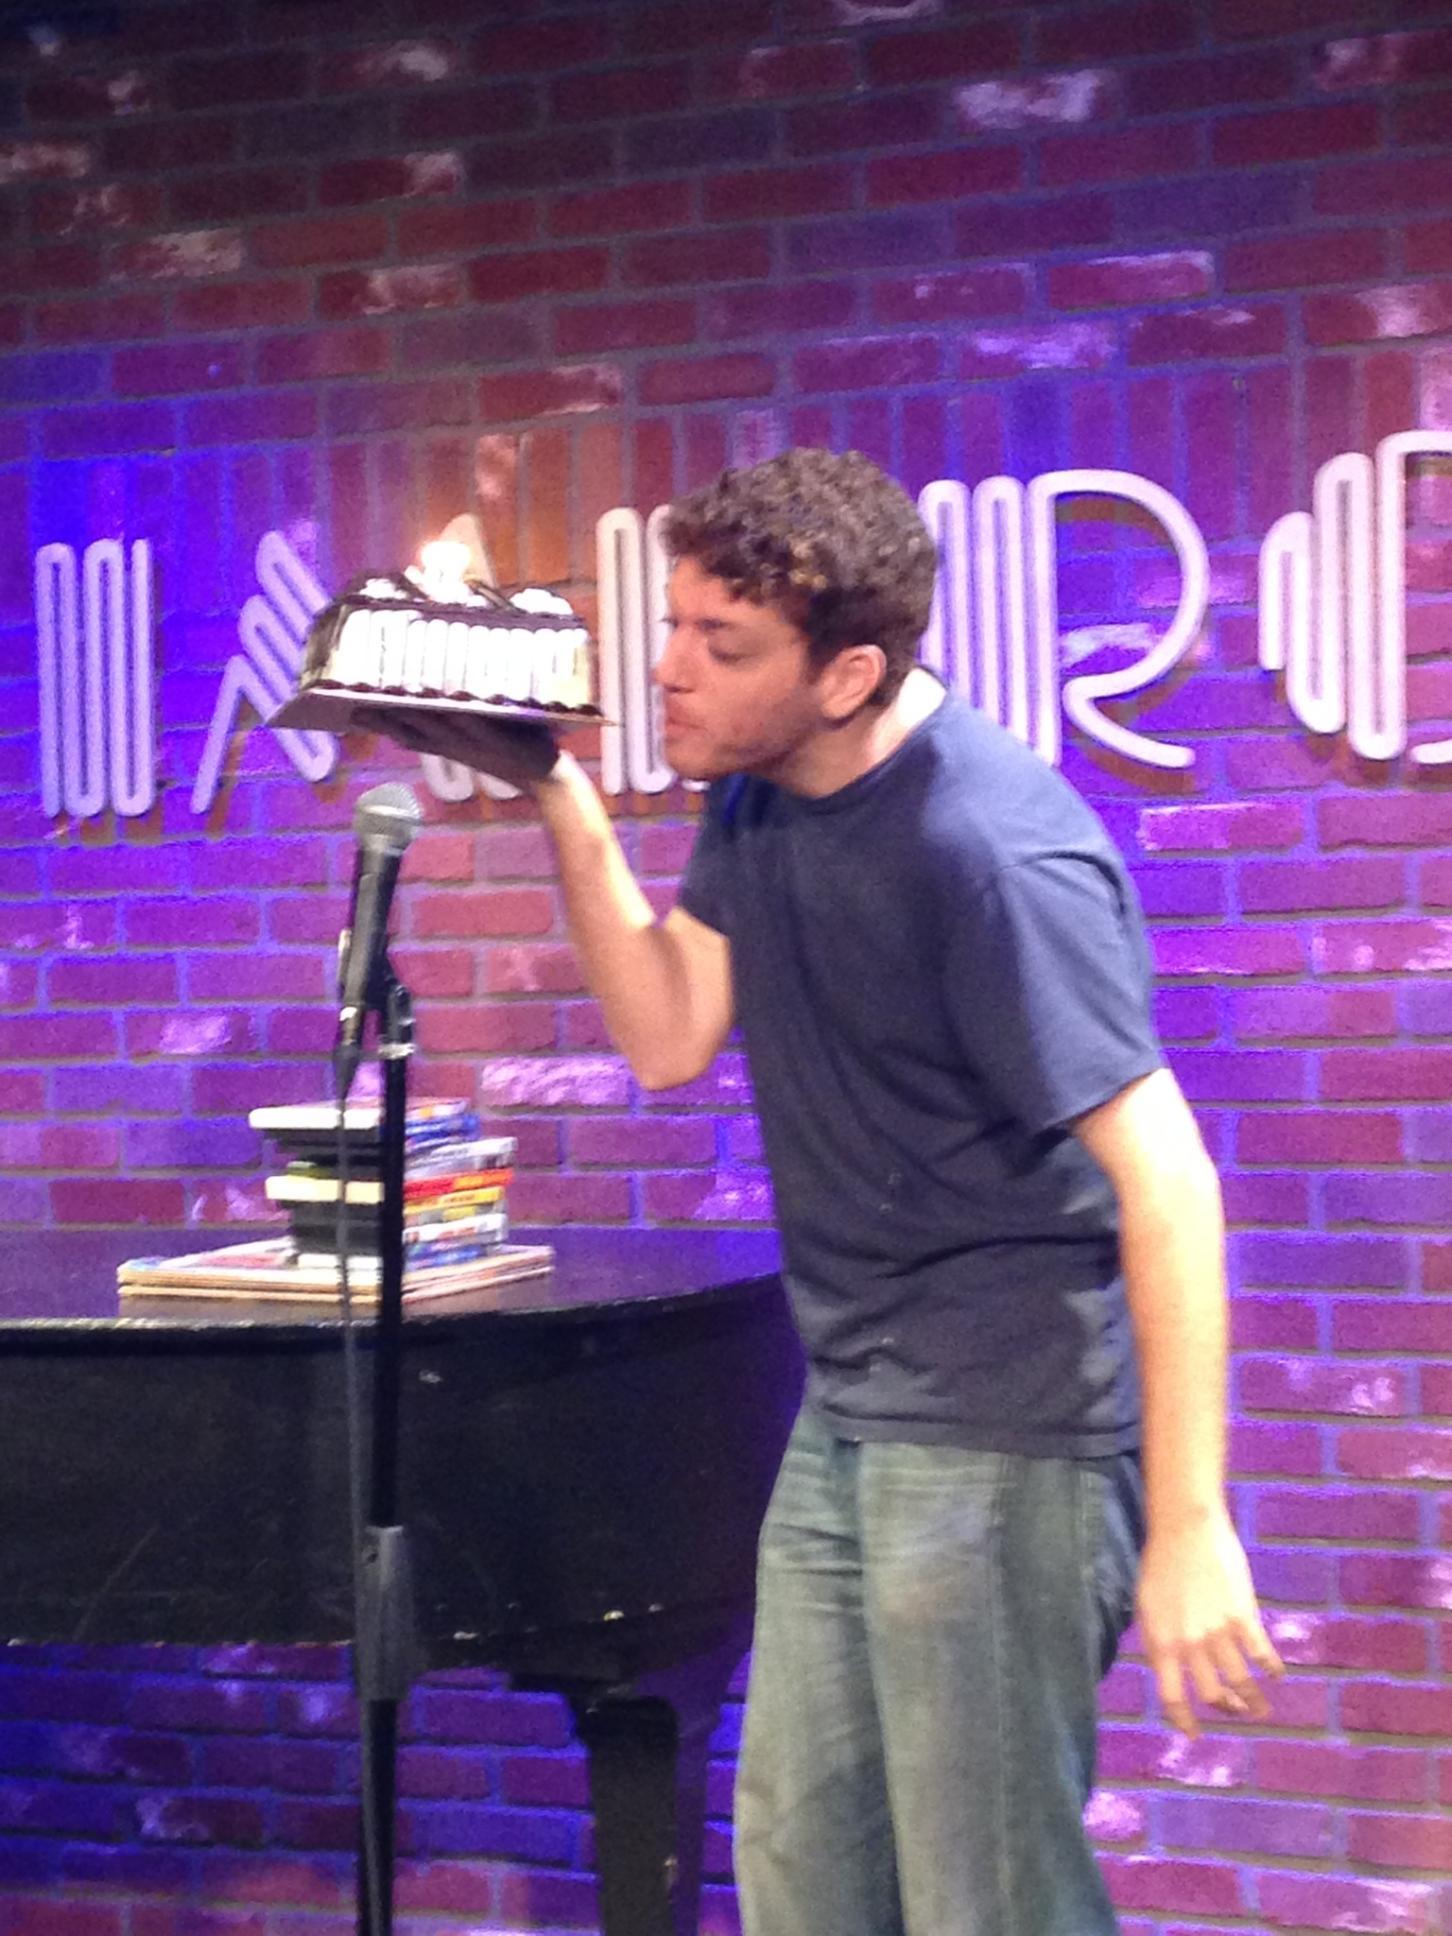 Jeffrey eats birthday cake 2014.jpg